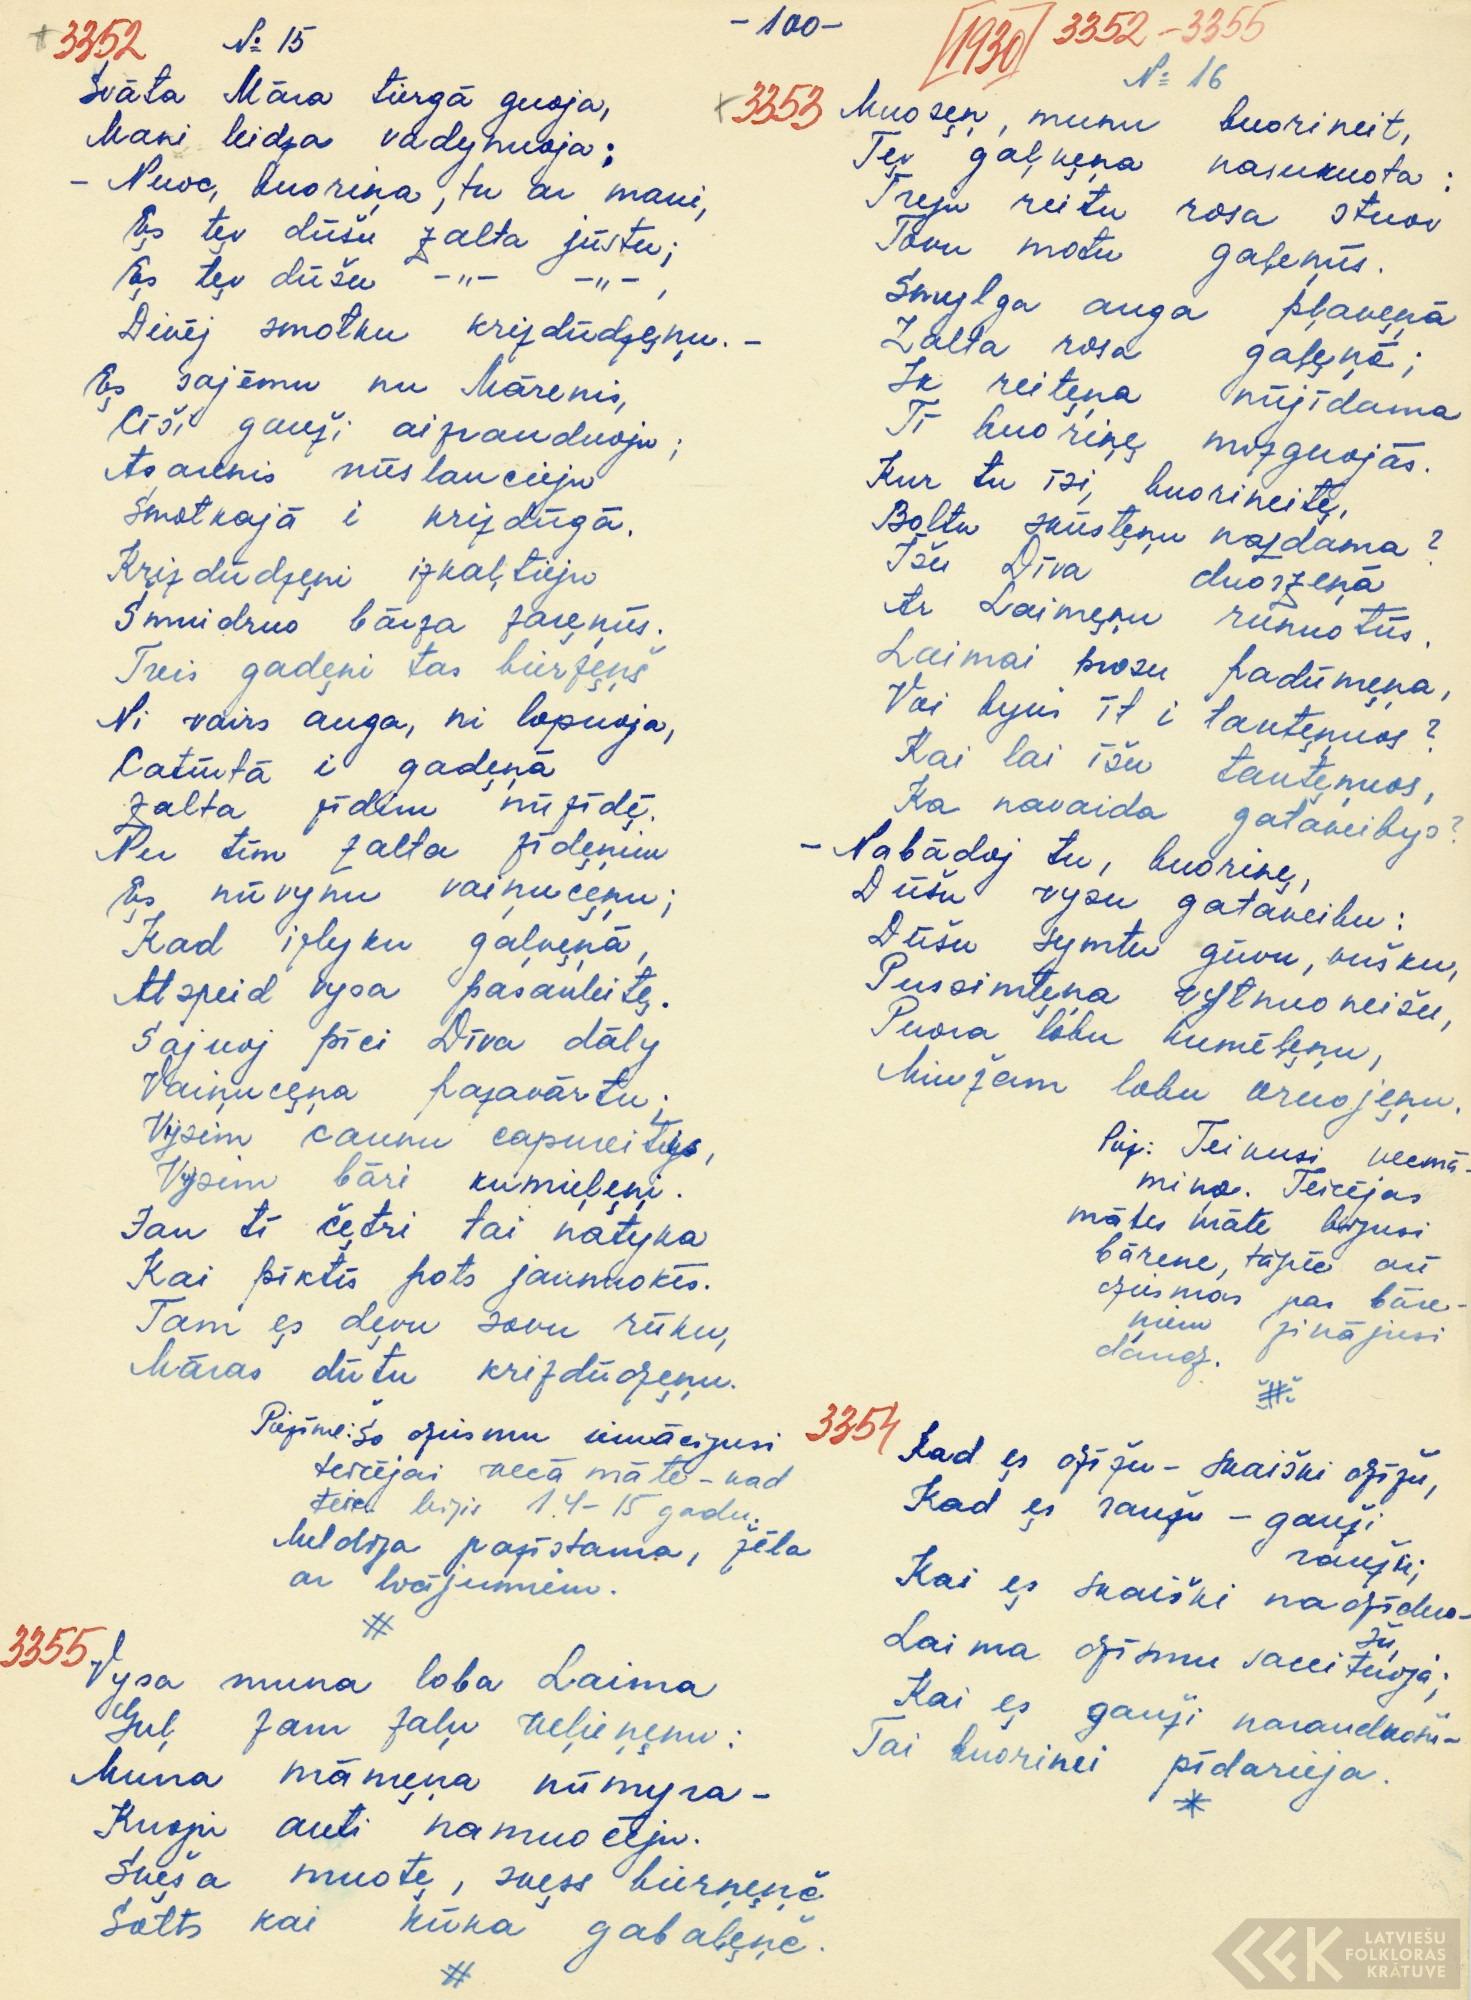 1930-10-zinatniska-ekspedicija-07-0071